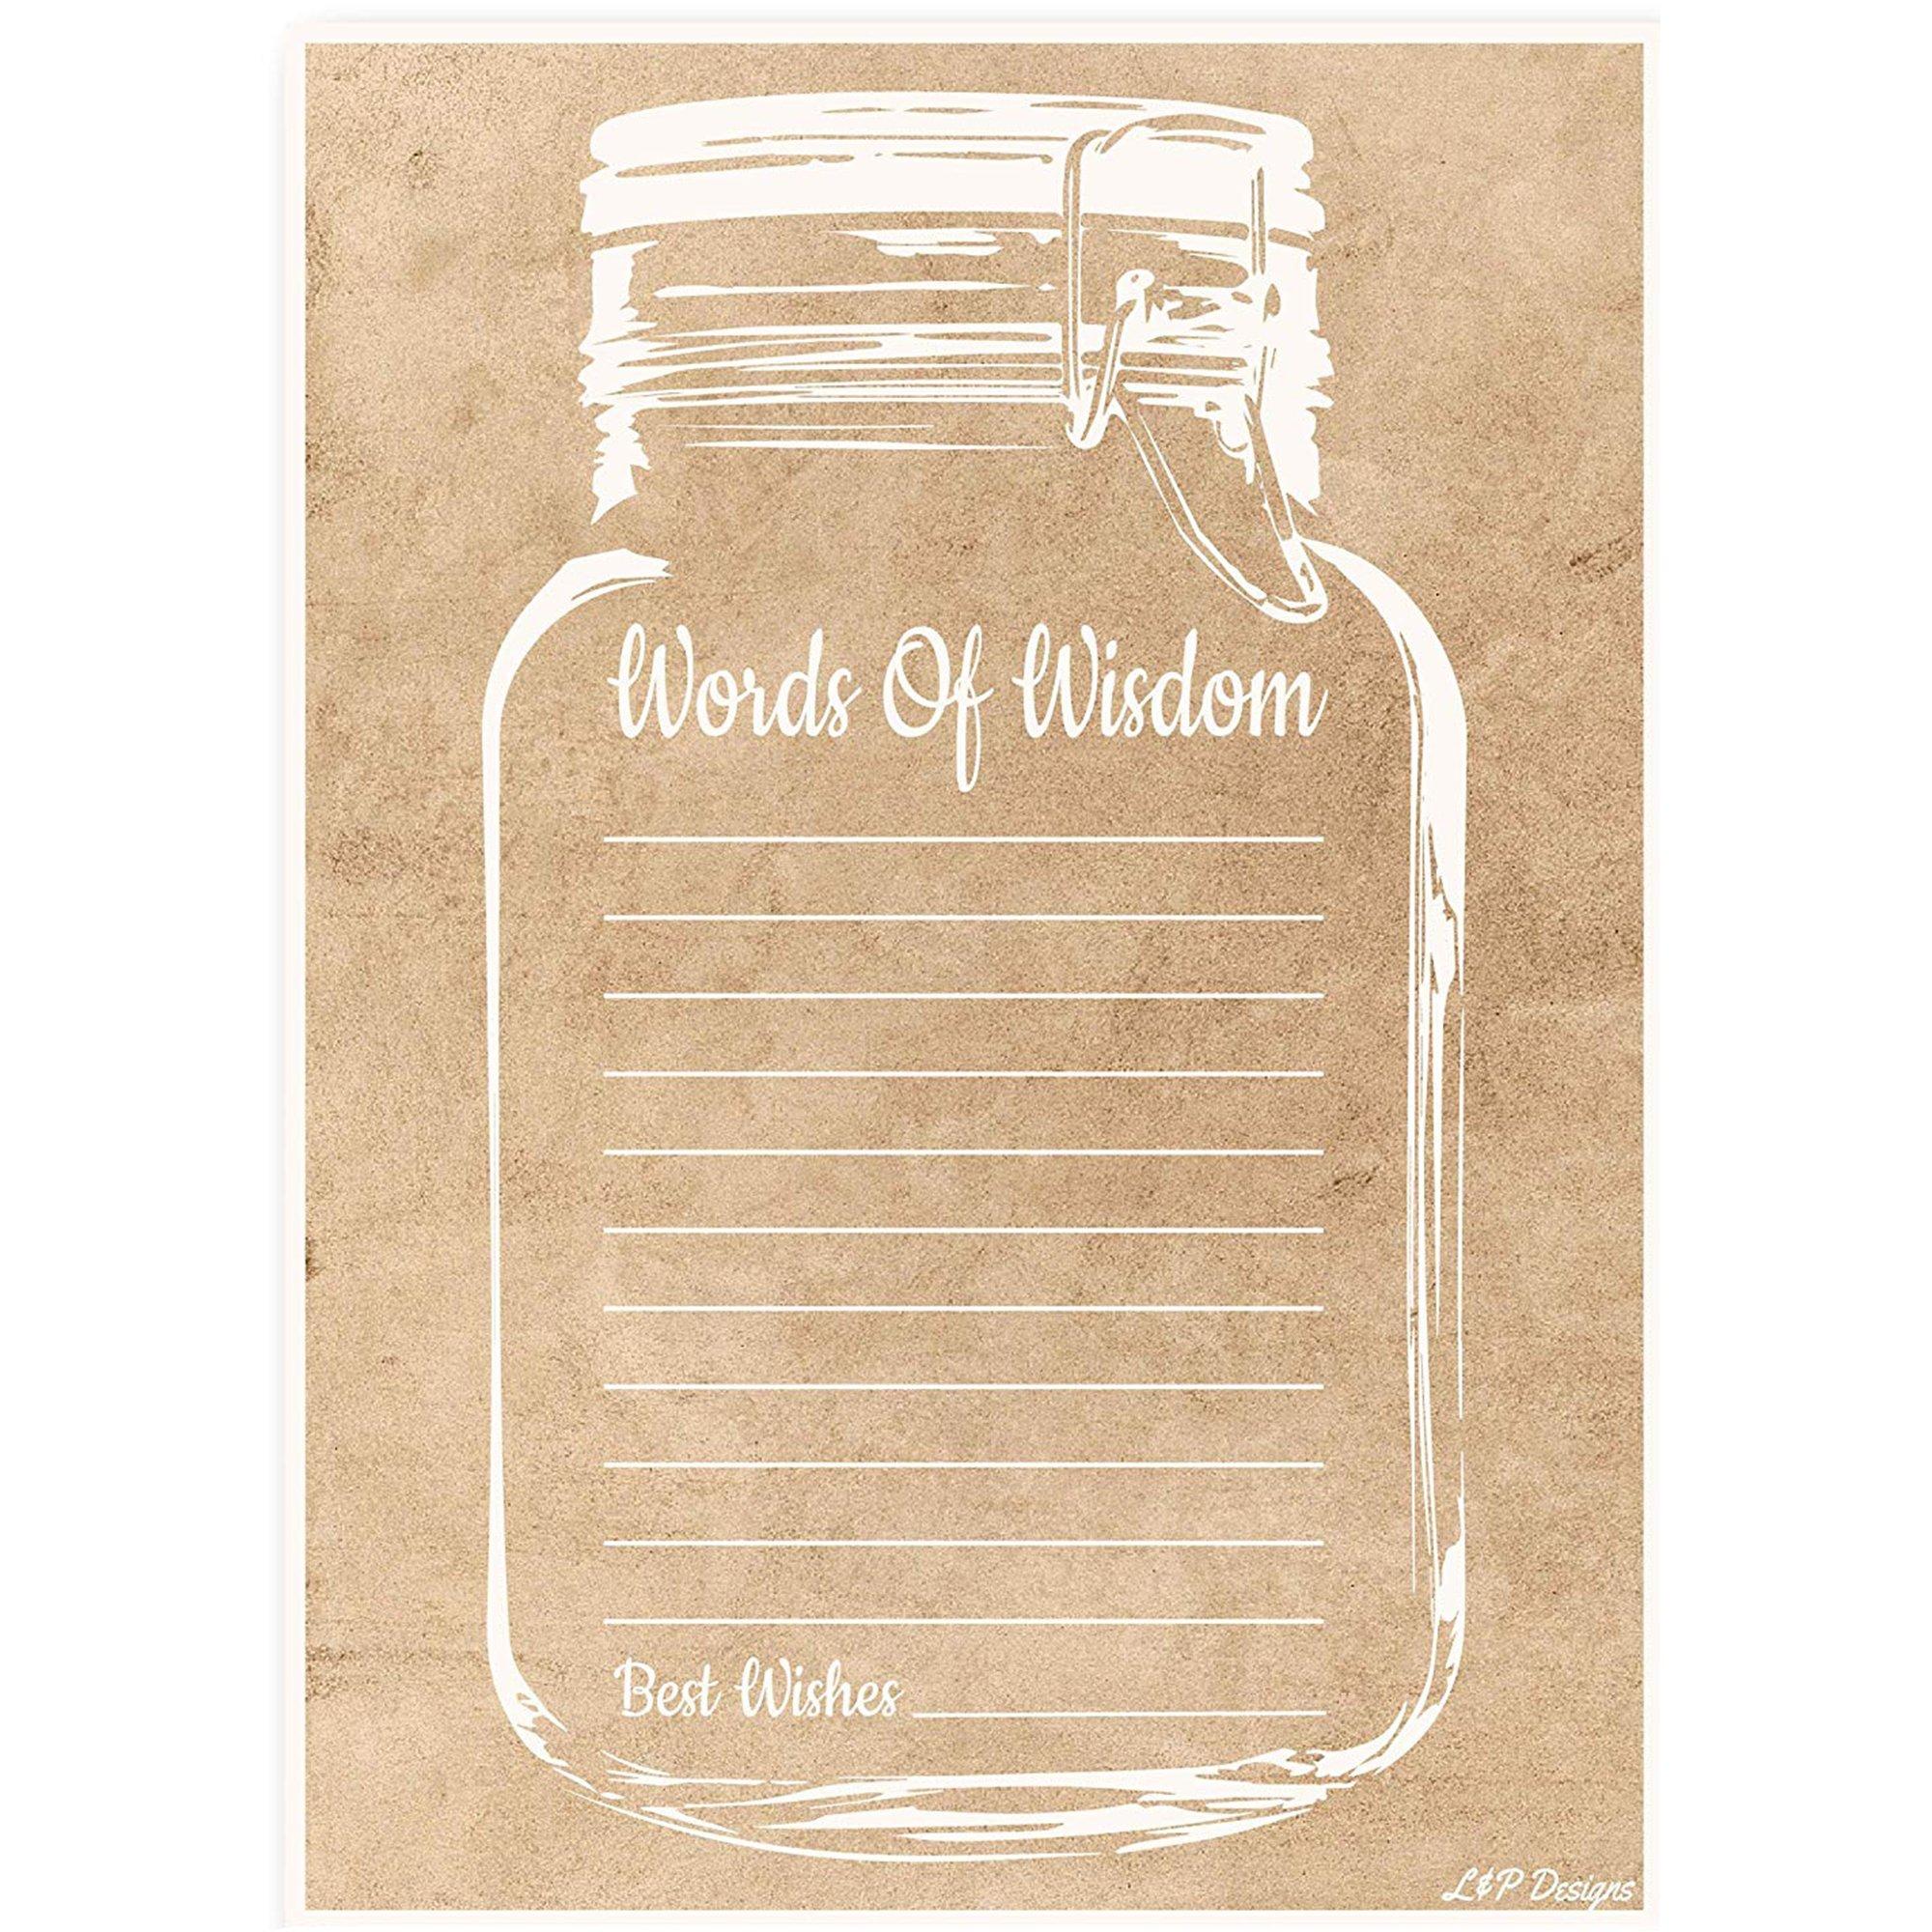 50 Rustic Mason Jar Gender Neutral Words of Wisdom Advice Cards, Graduation Advice Cards, Marriage or Wedding Advice Cards, Bridal Shower, Baby Shower, Boy/Girl Baby Prediction Advice, Housewarming